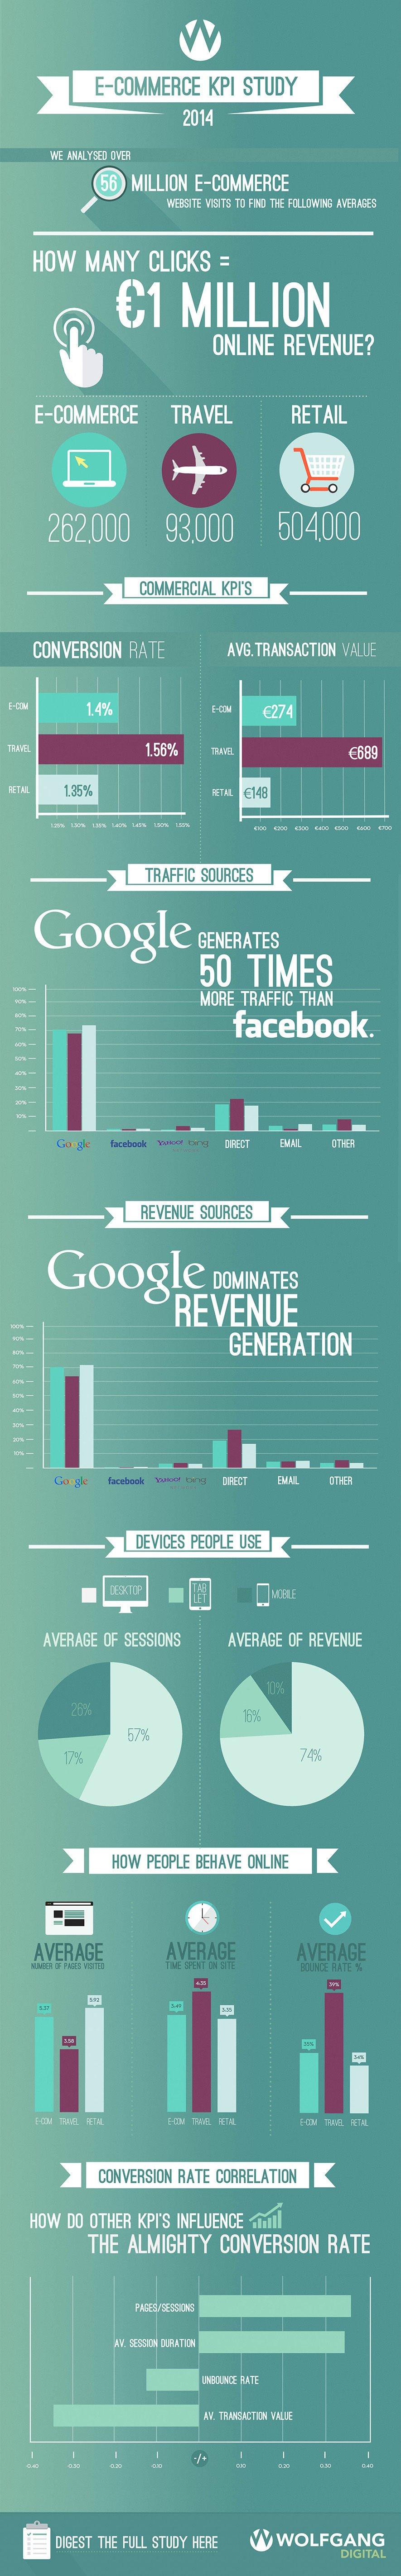 E-Commerce KPI Infographic 2014